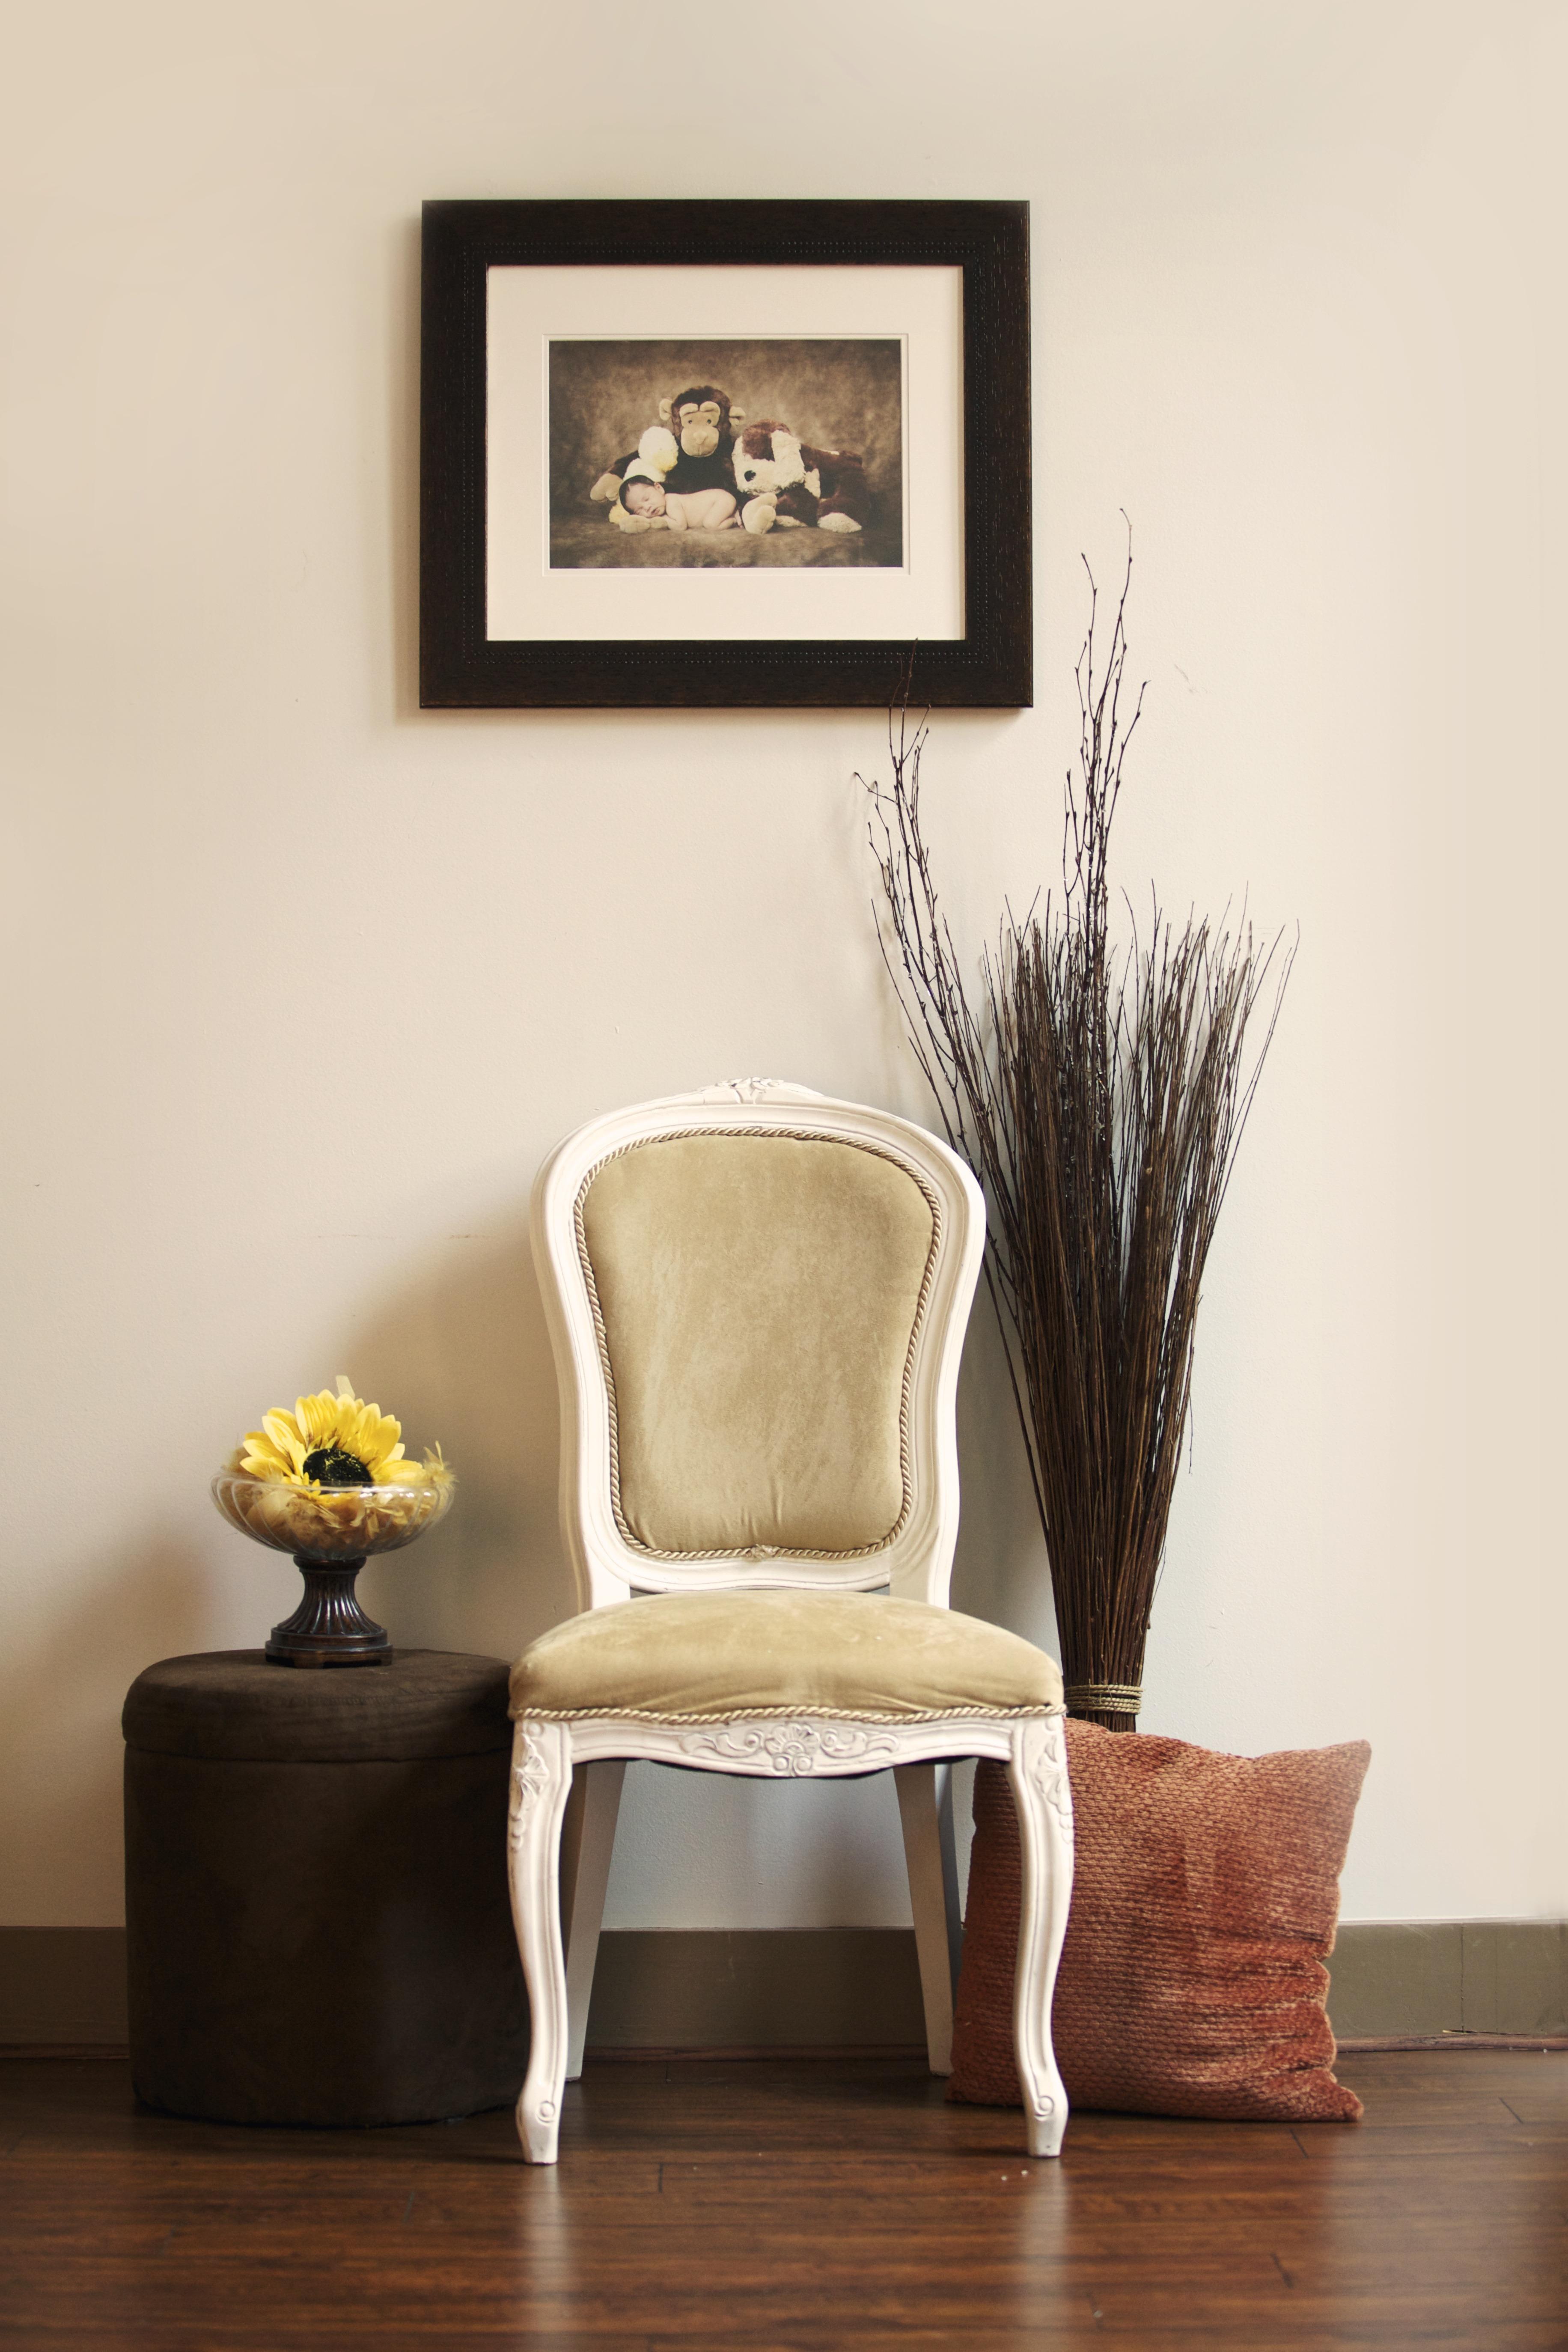 Fotos Gratis Mesa Madera Silla Piso Asiento Interior Pared  ~ Decoracion Pared Salon Original